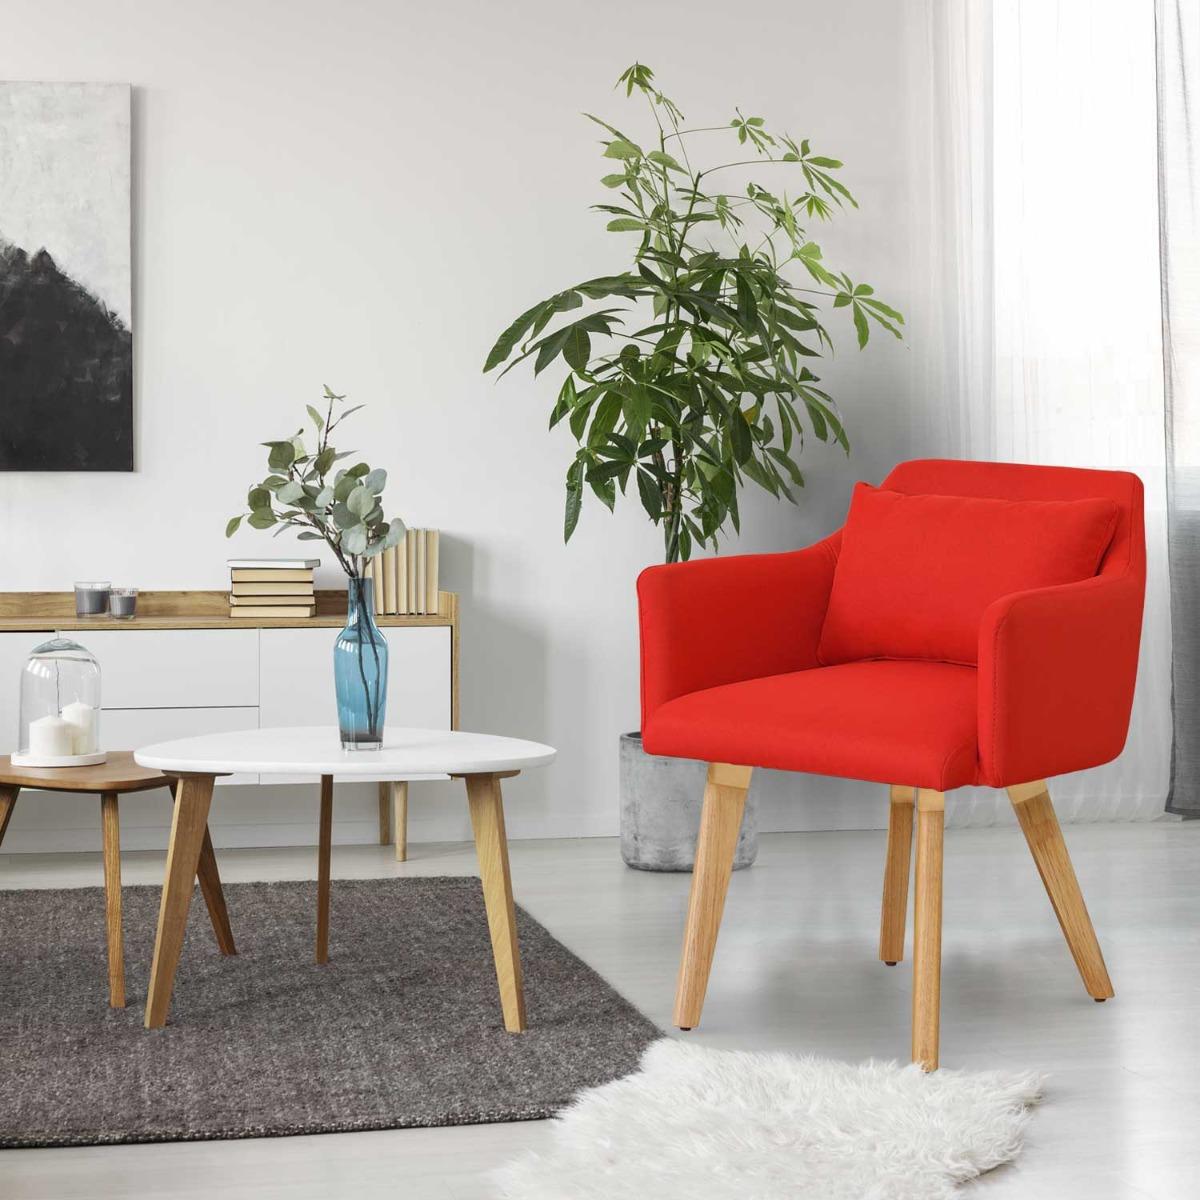 Sedia / poltrona scandinava Gybson in tessuto rosso